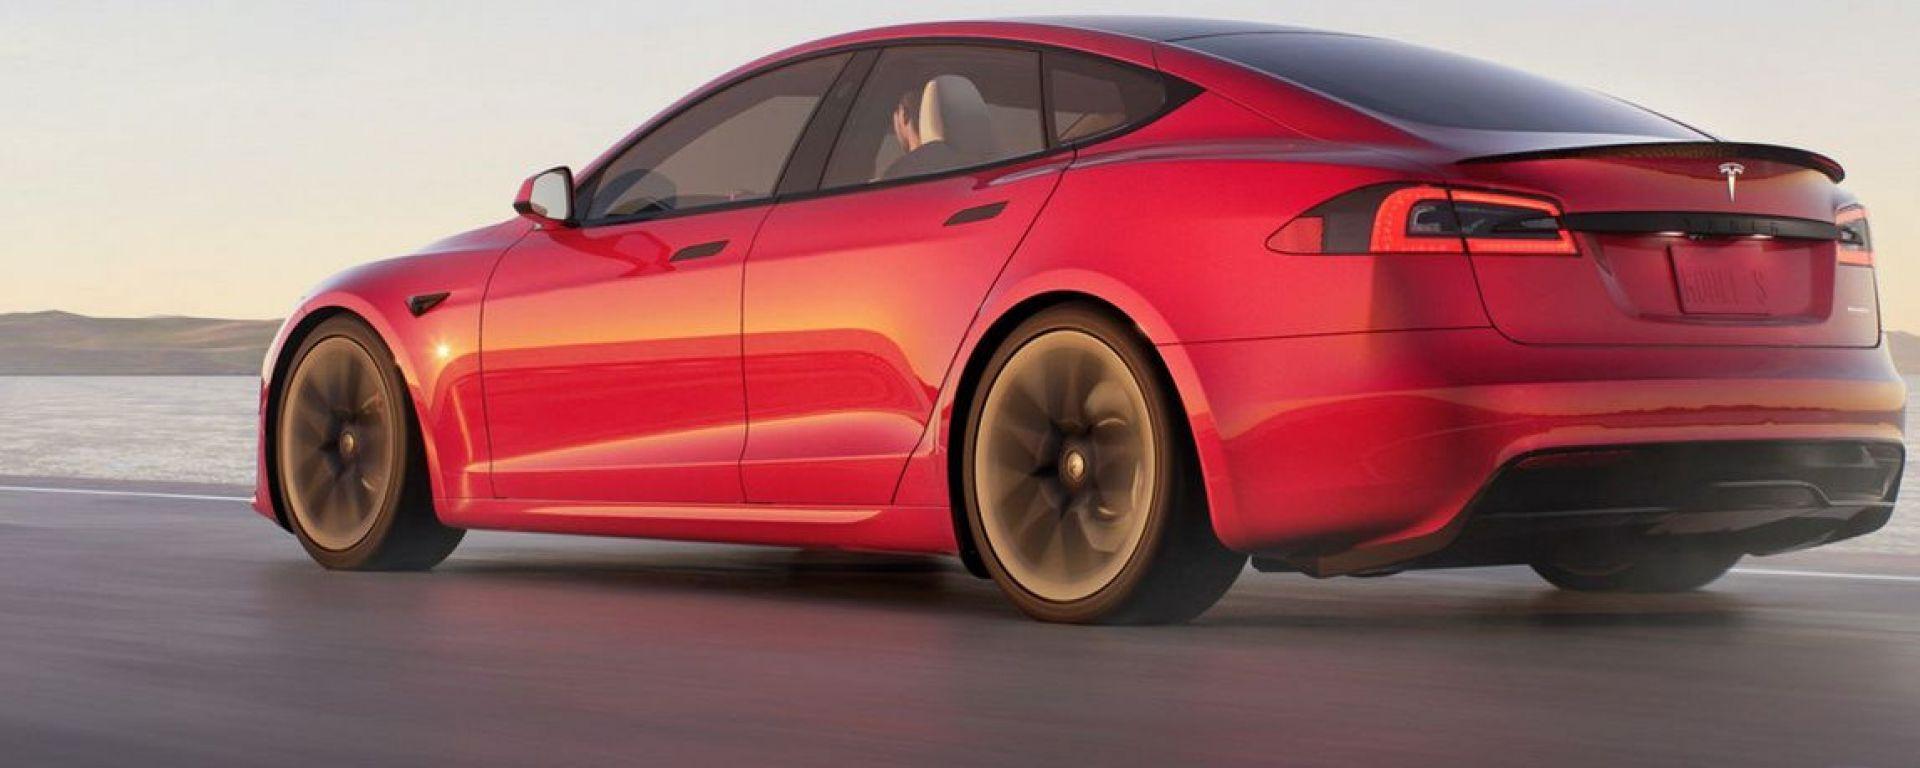 Tesla Model S Plaid, niente versione Plus